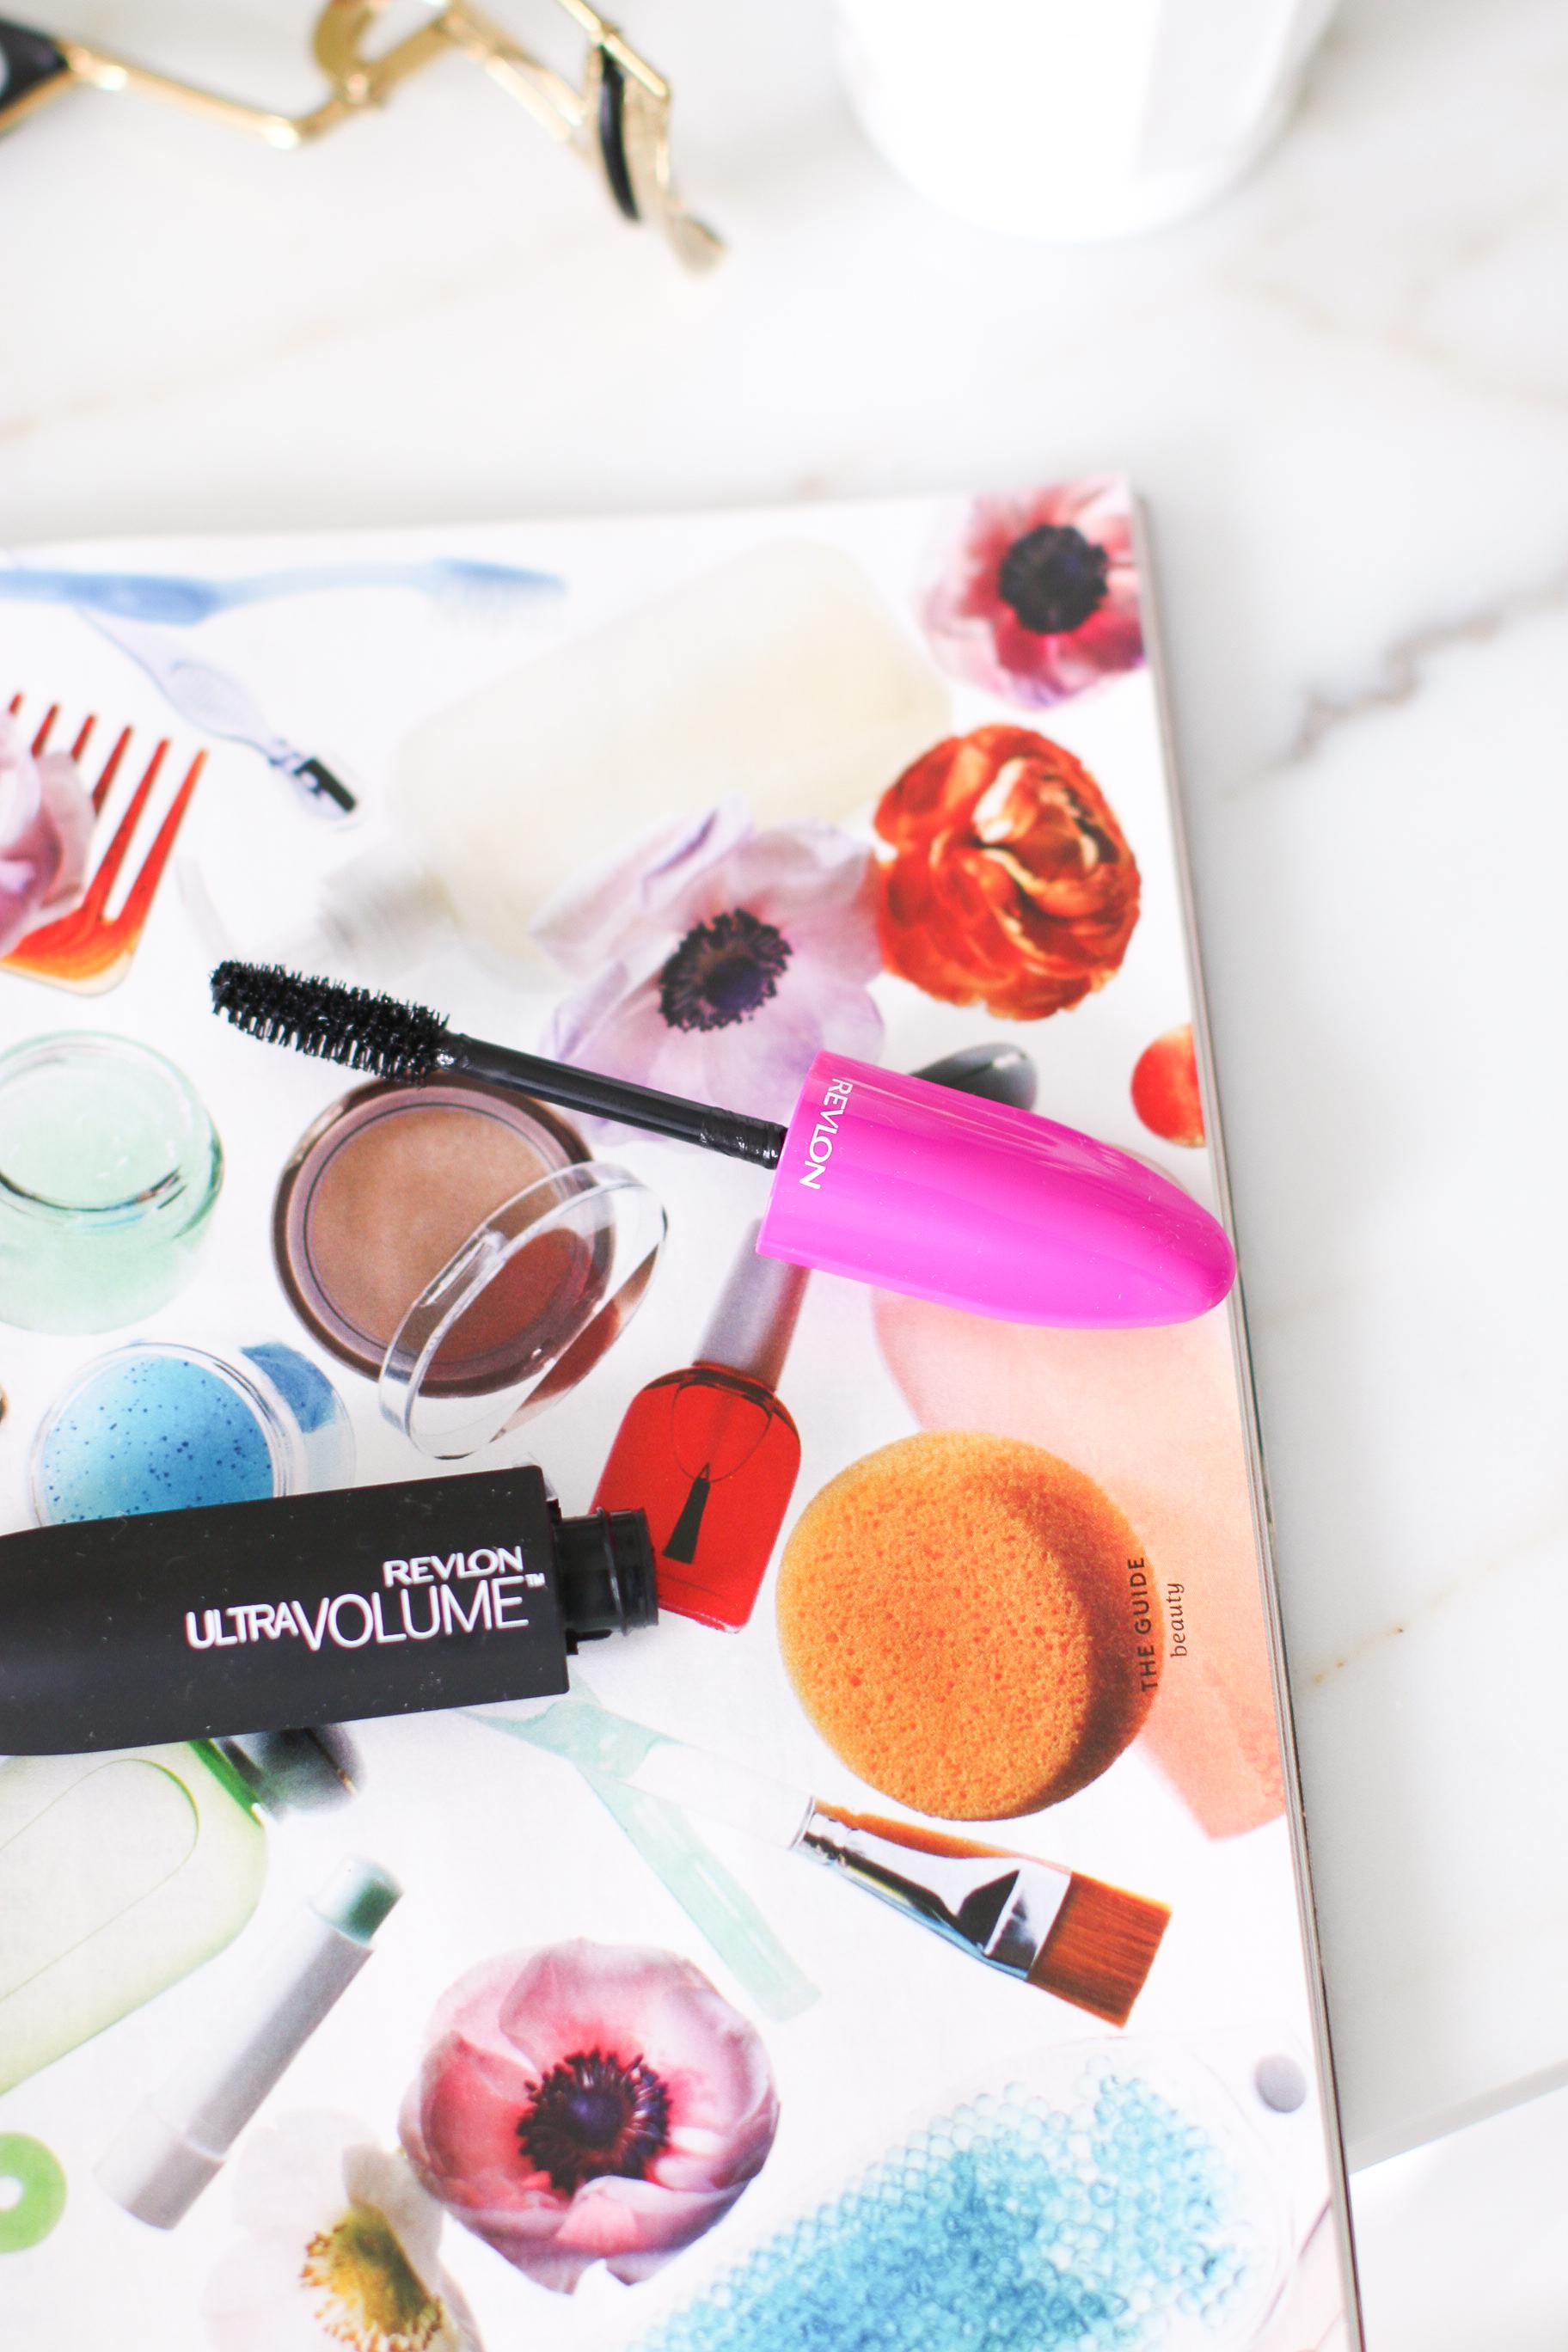 Revlon Drug Store Mascara Review